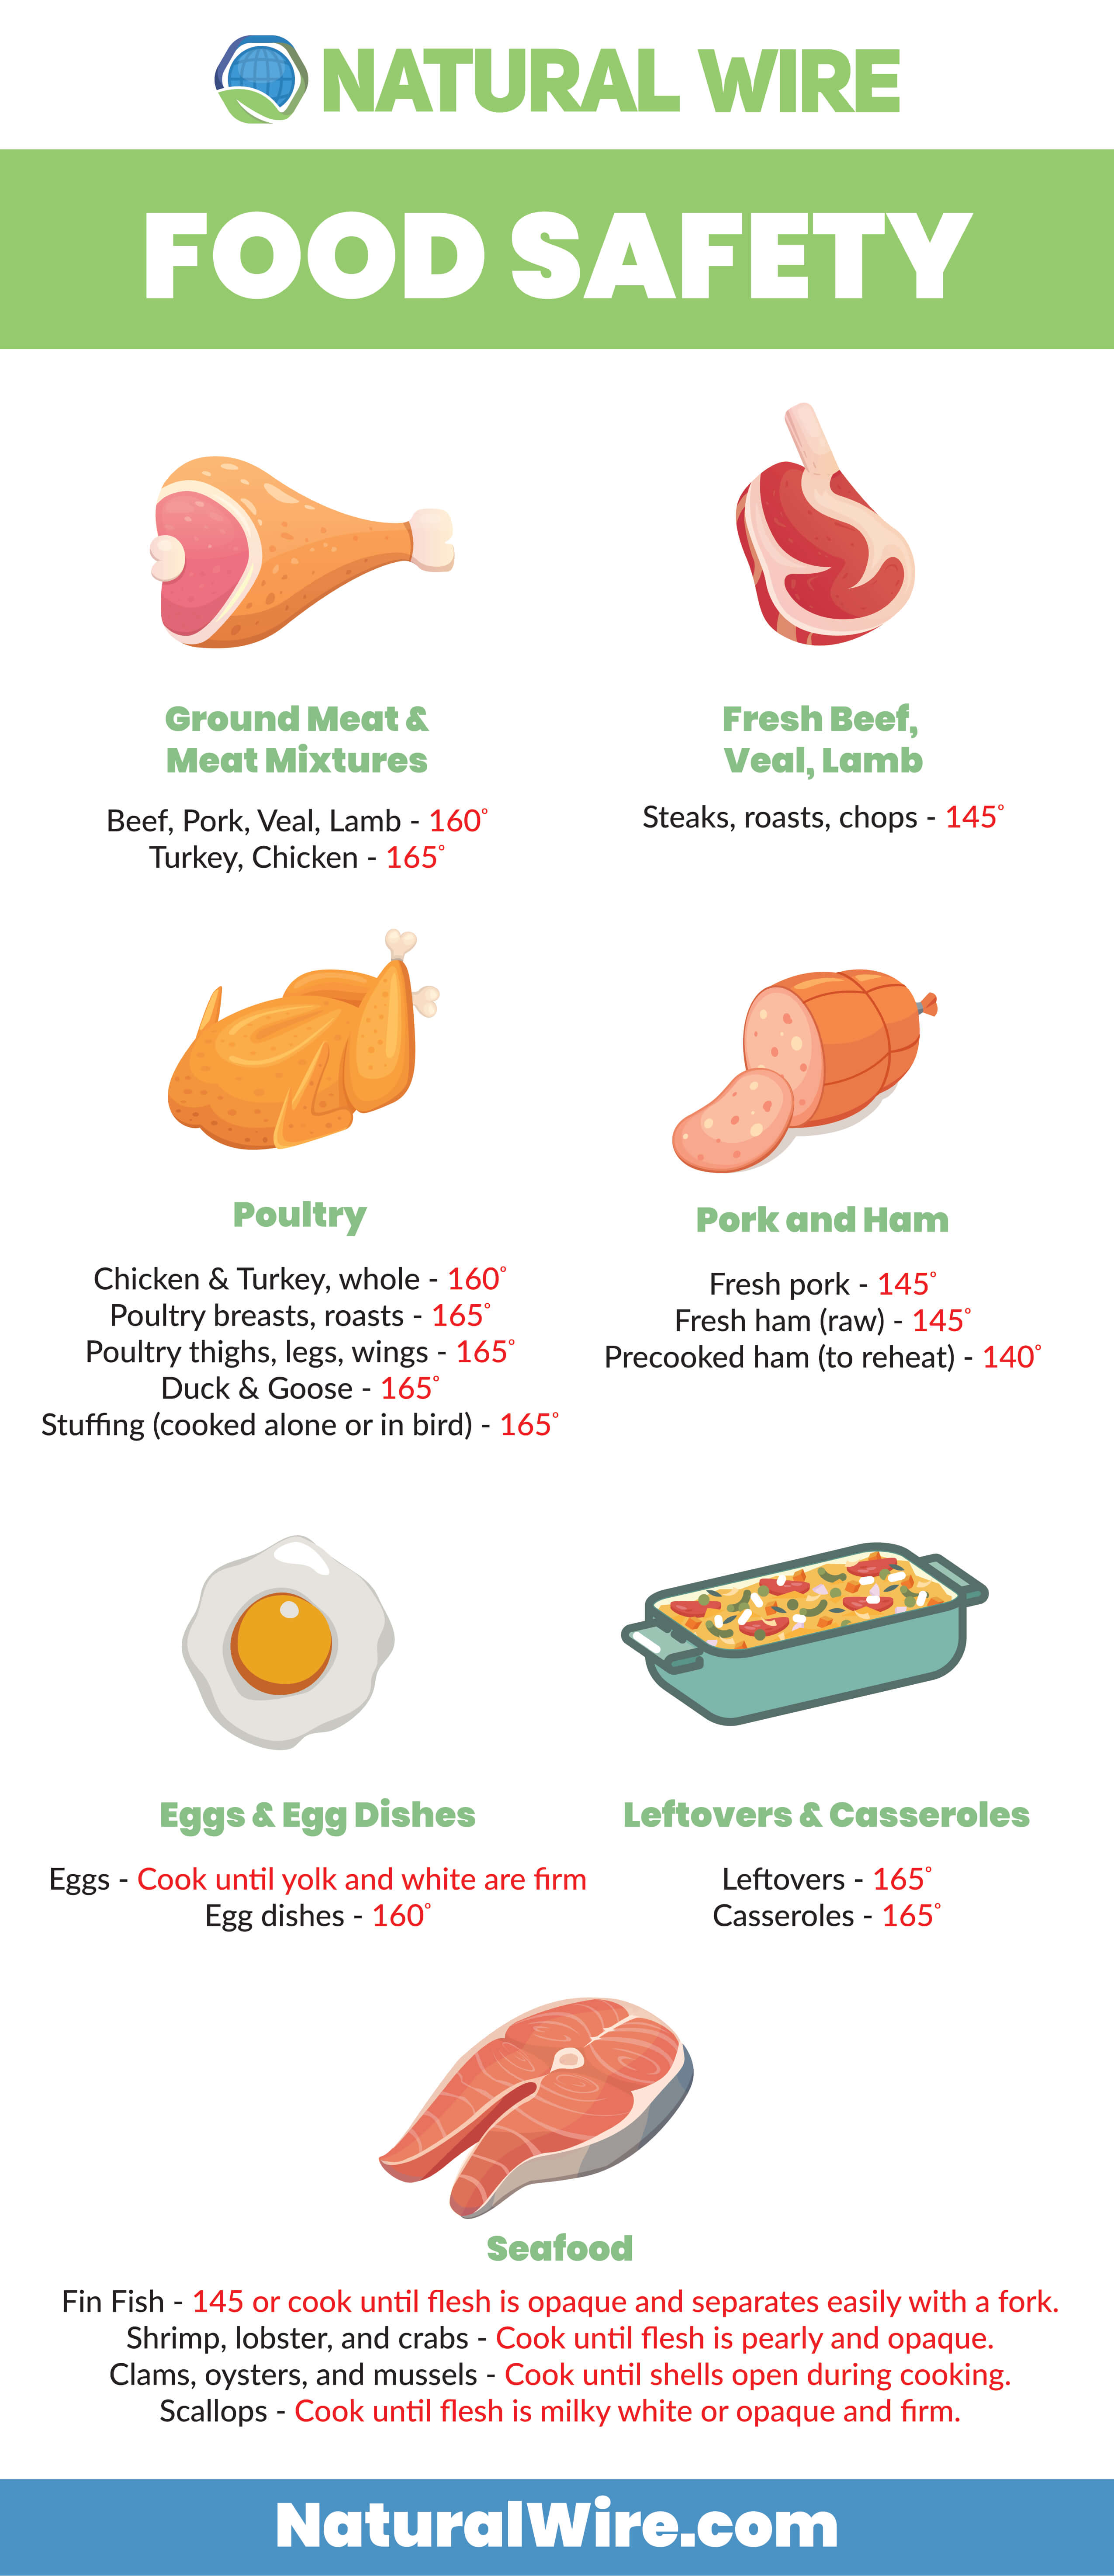 FoodSafetyInfographic